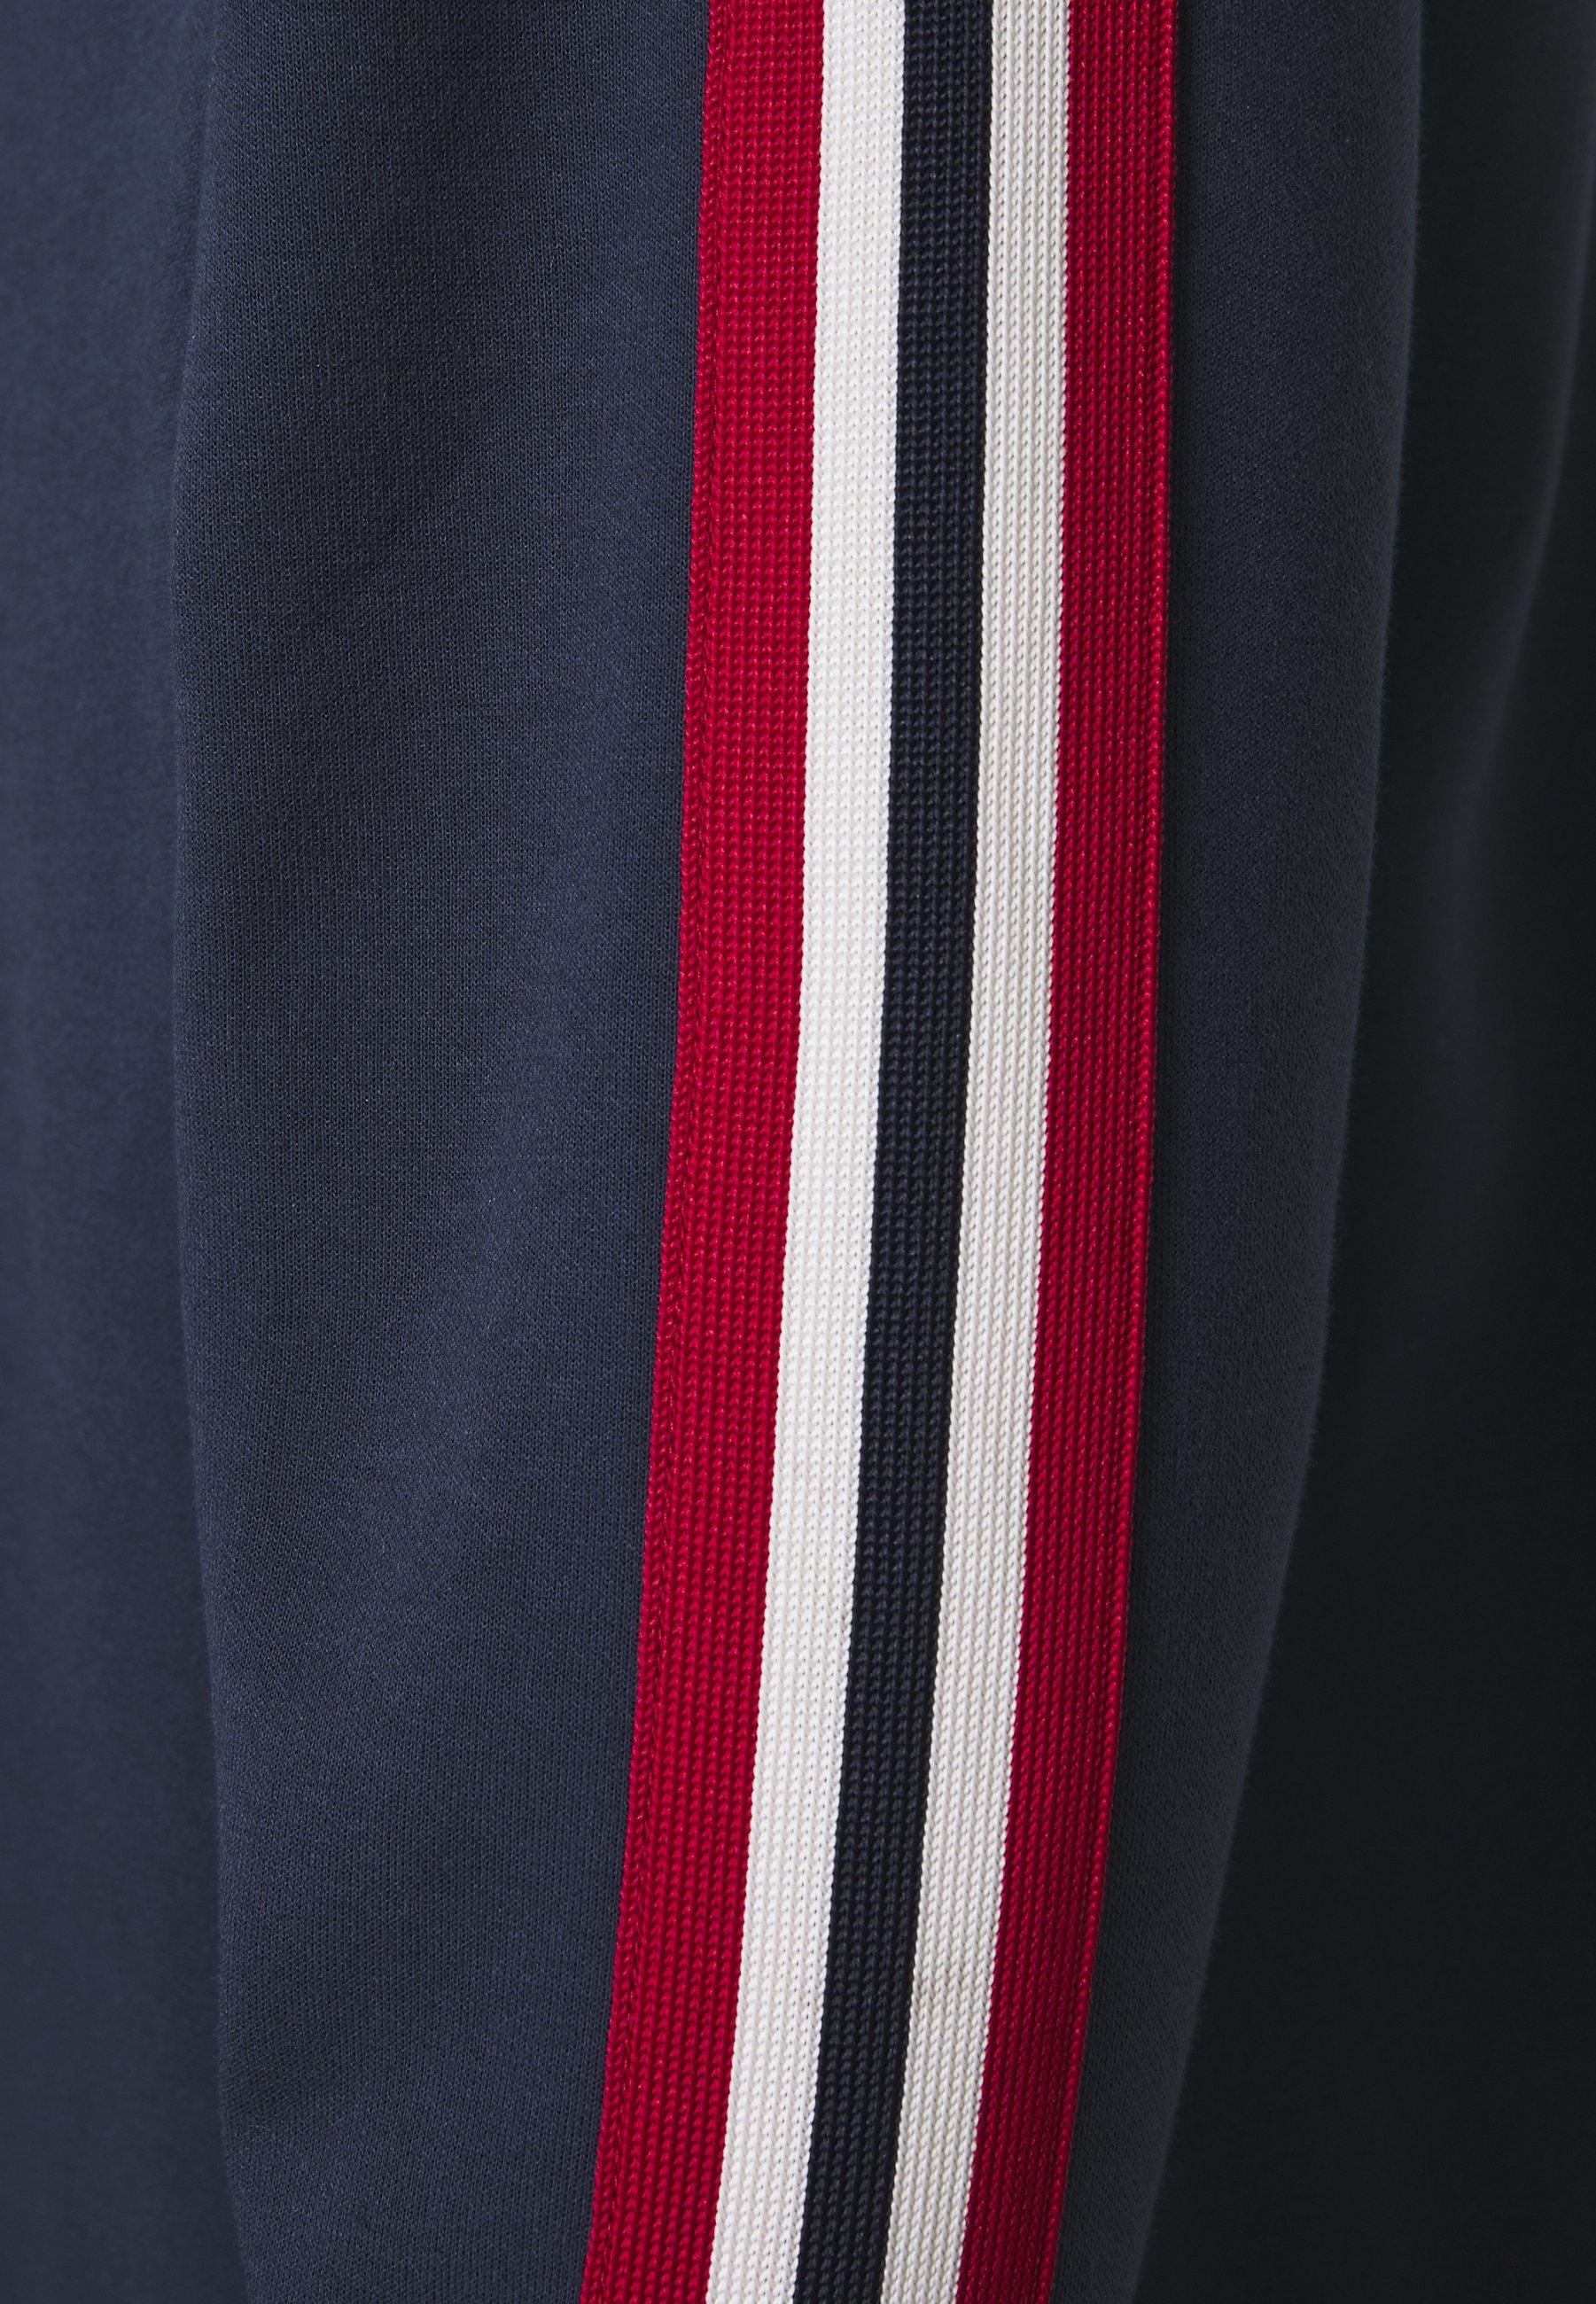 Franklin & Marshall Poloskjorter - navy